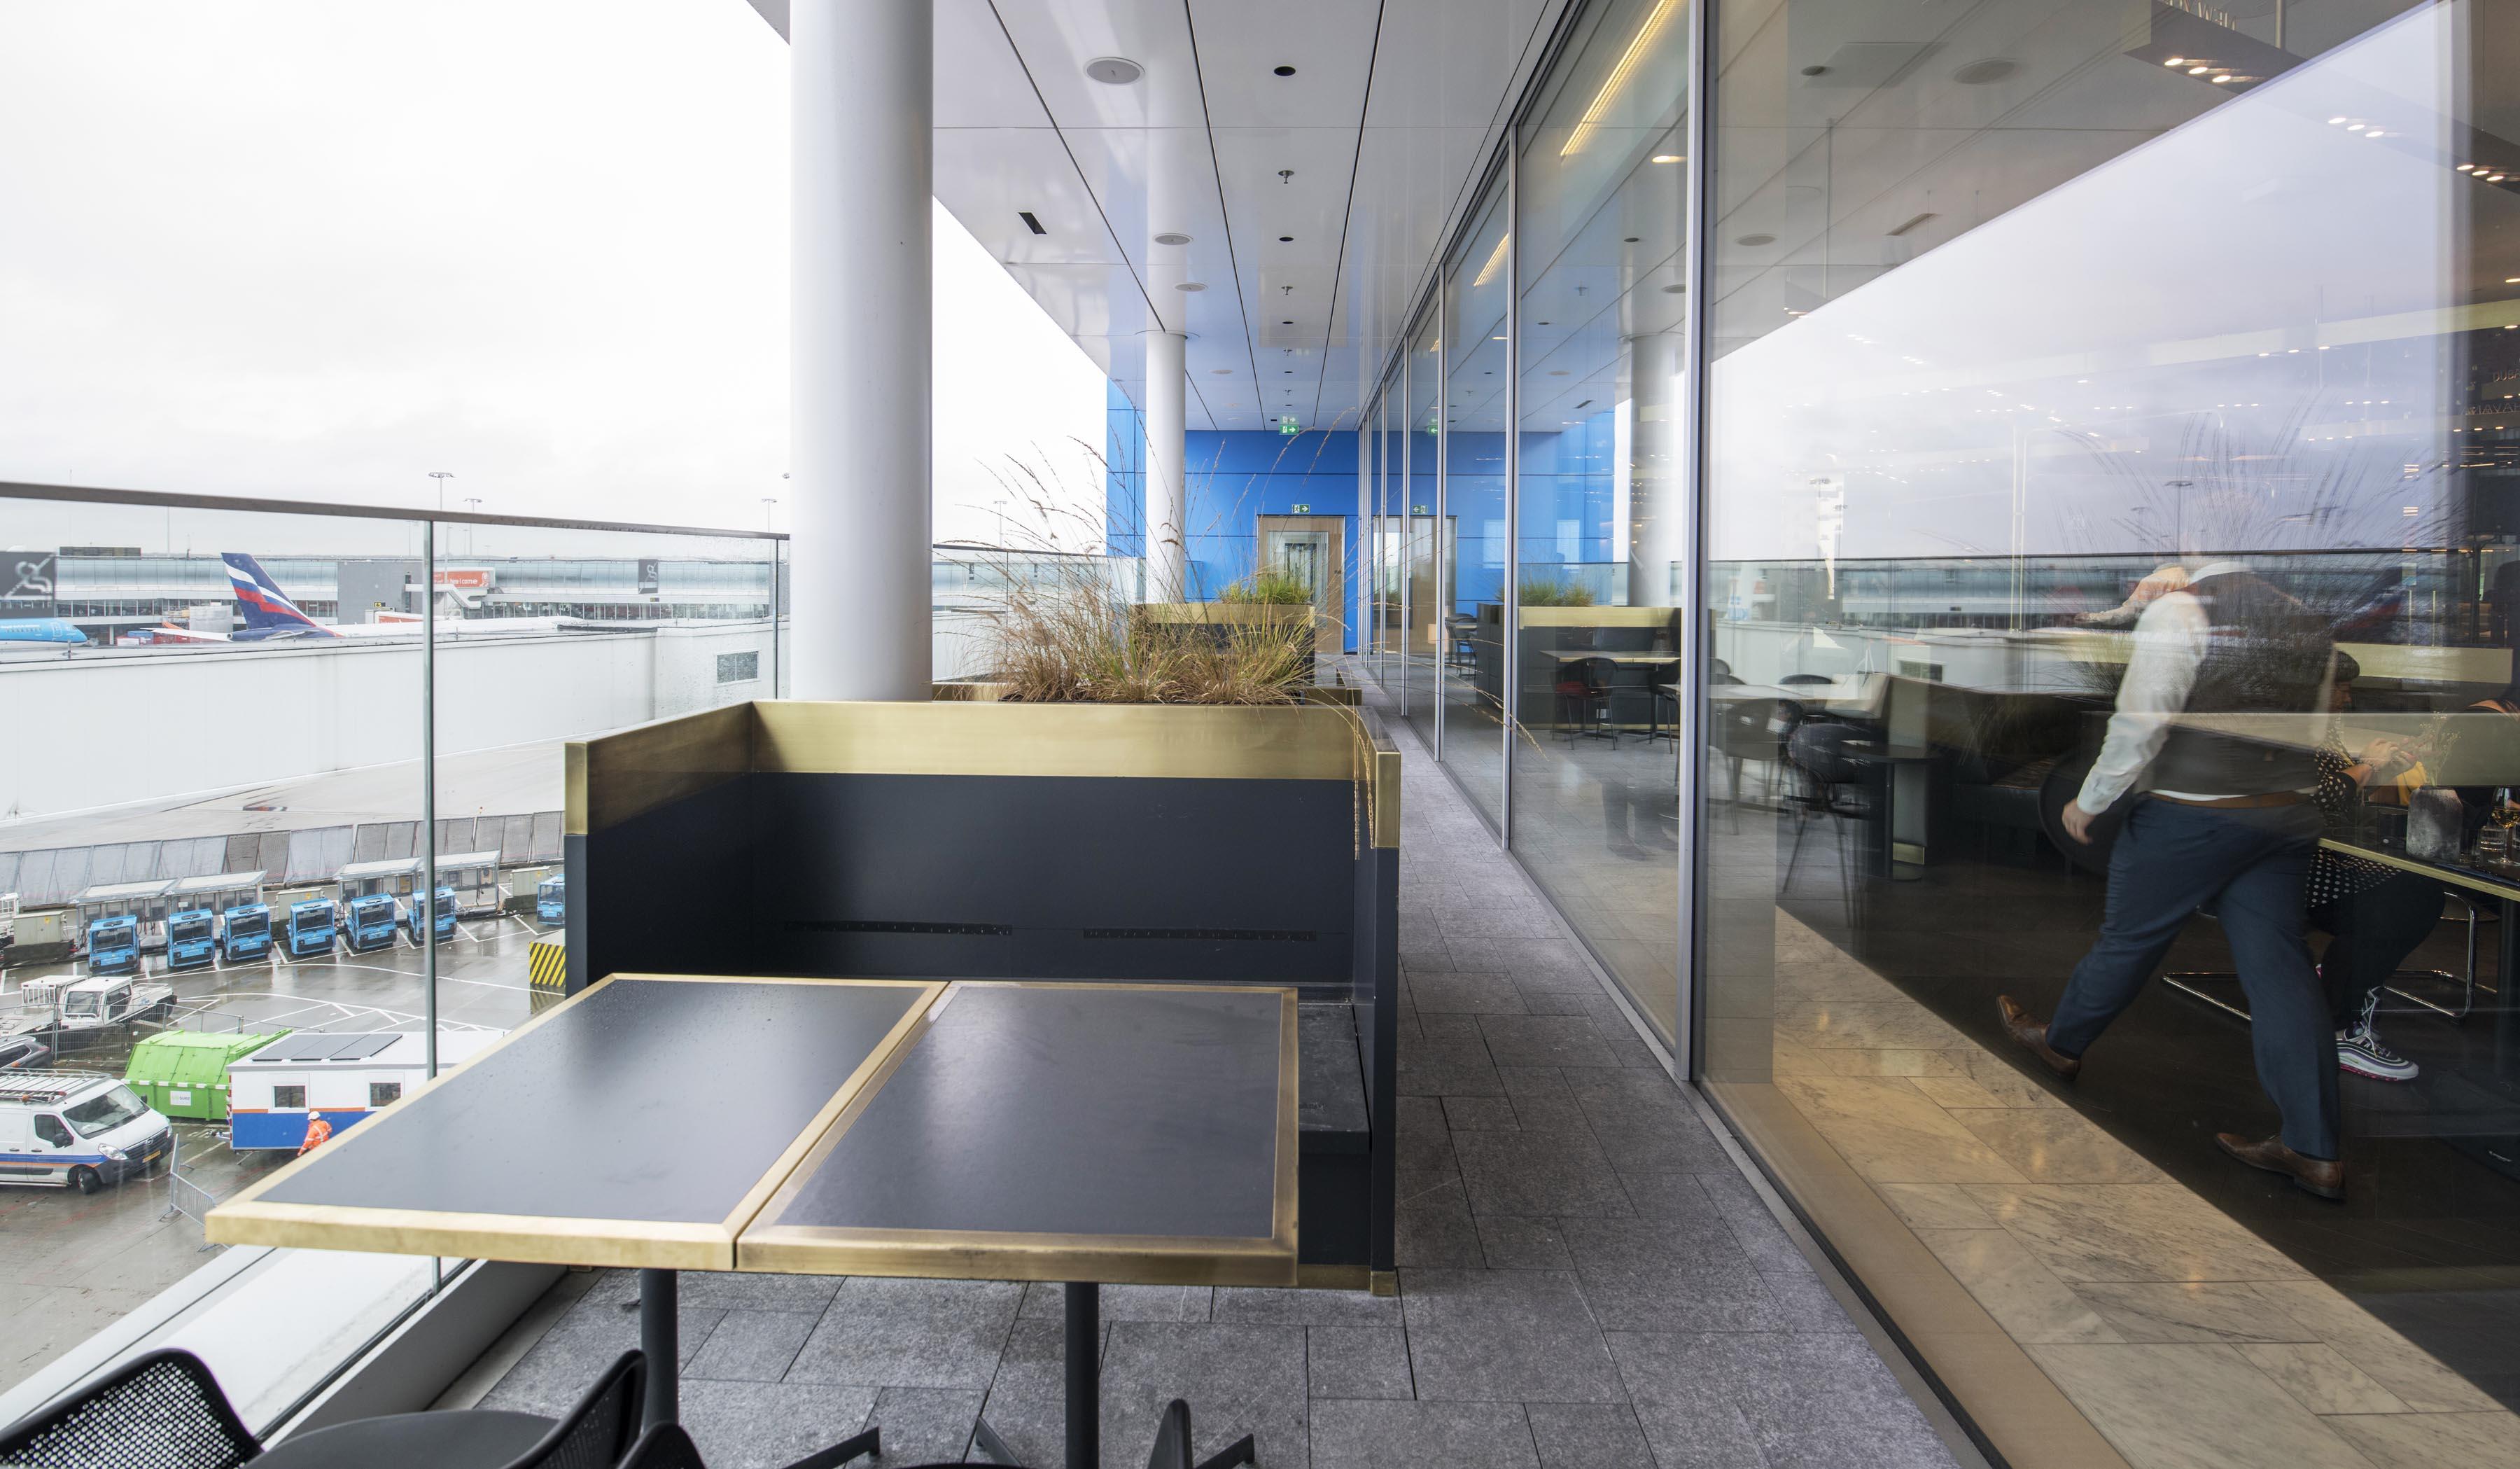 KLM-Crown-Lounge-anmeldelse-10